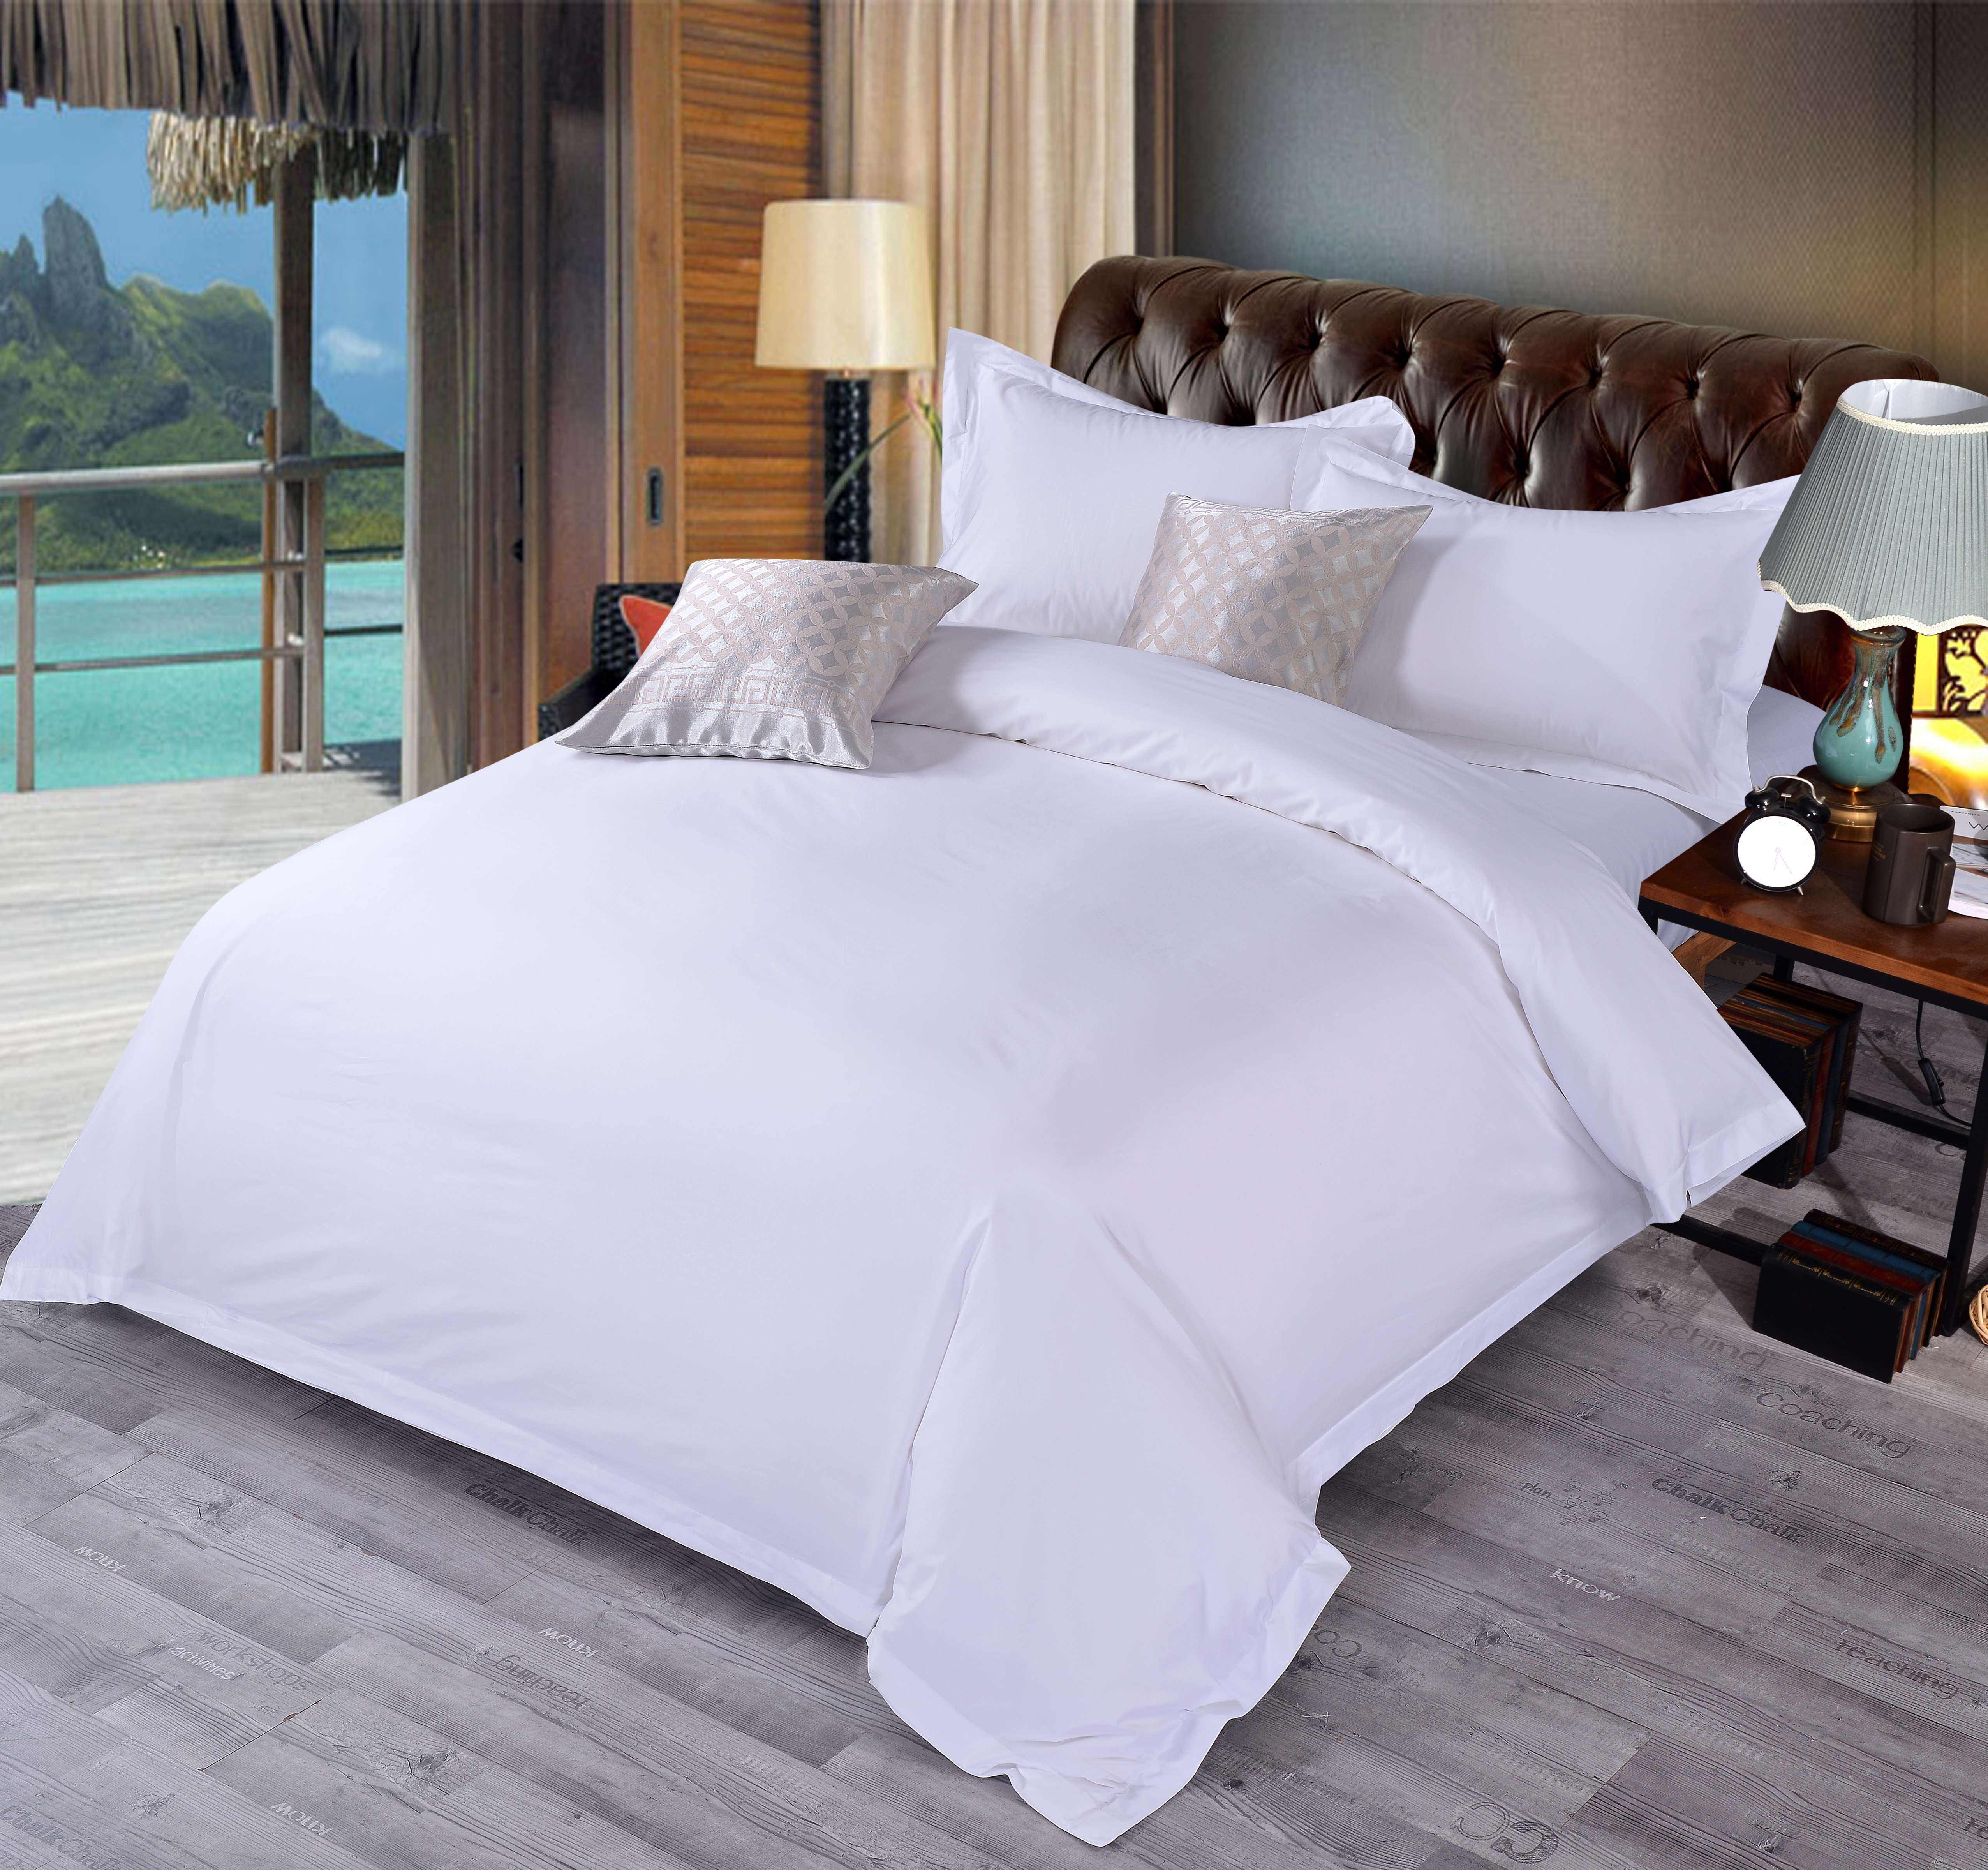 Hotel sateen sheets — img 9